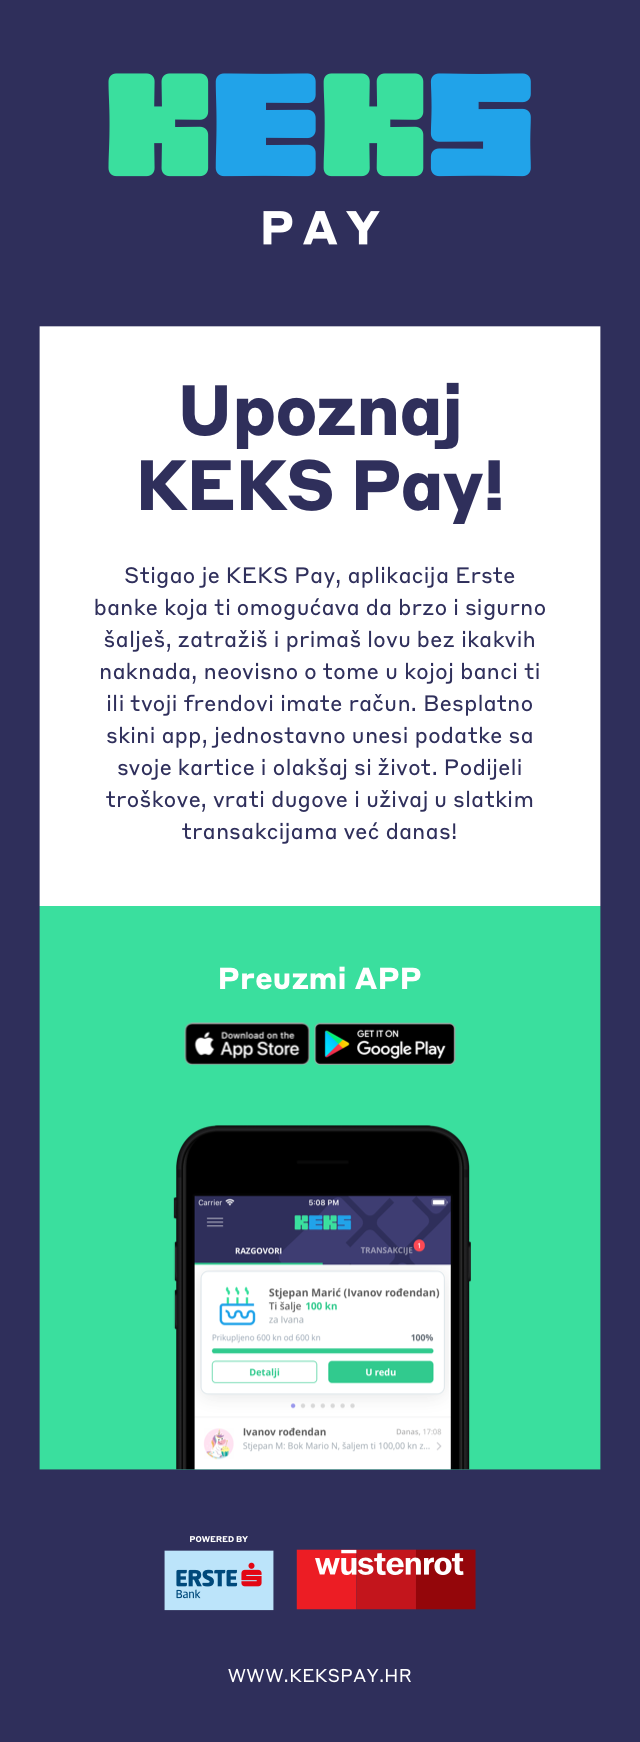 aplikacije za druženje bez kreditne kartice privlačno ime za internetska druženja